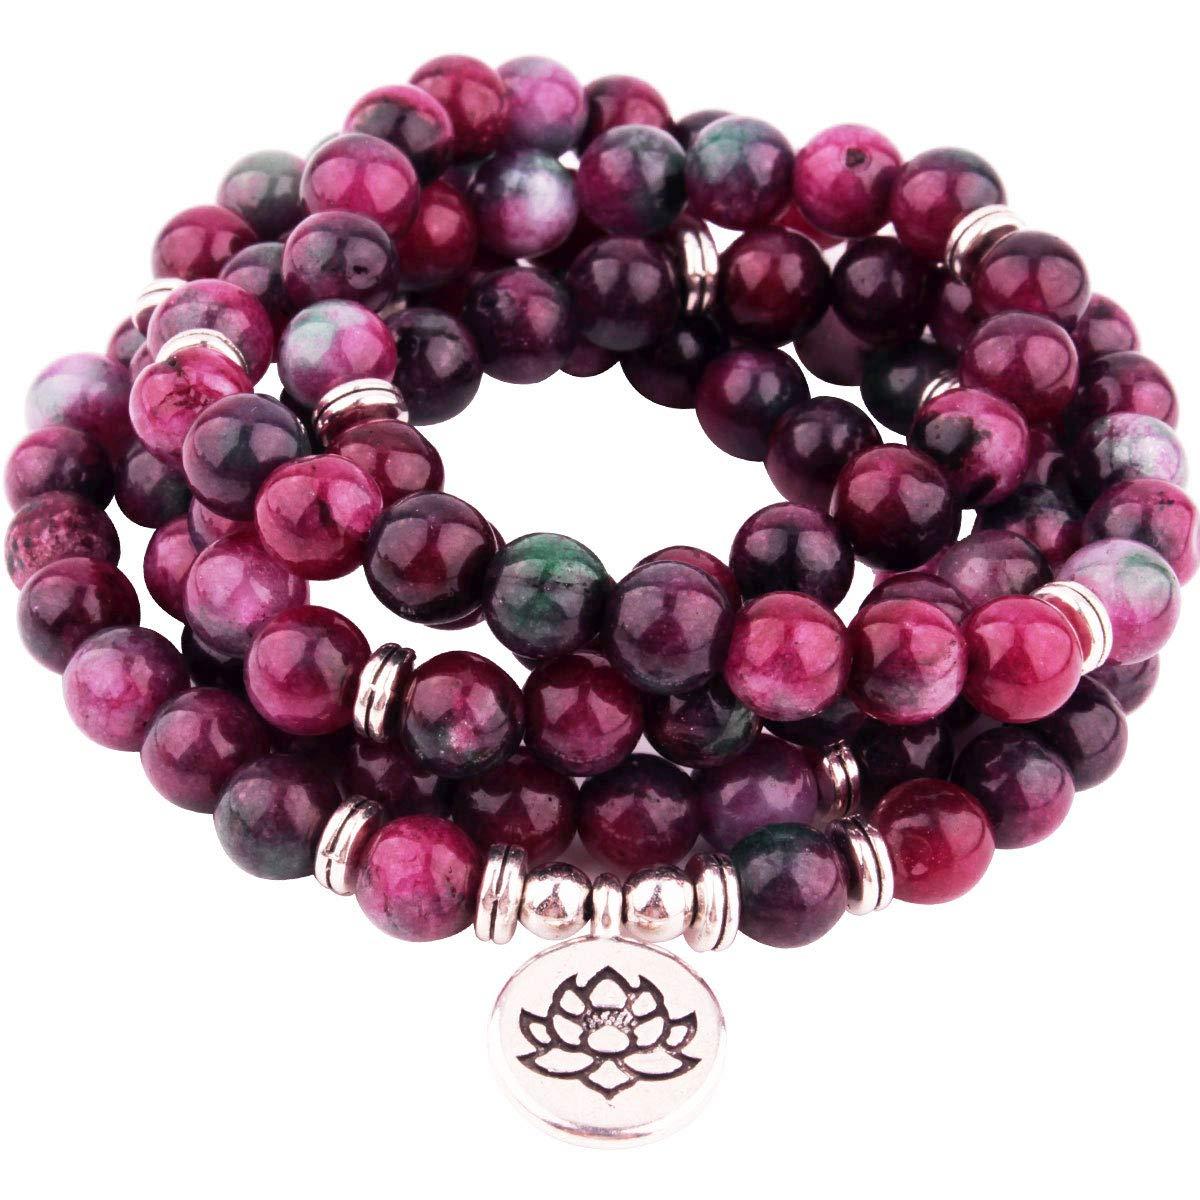 GVUSMIL 108 Mala Beads Wrap Bracelets Charm Natural Gemstone Colorful Mala Bead Bracelet by GVUSMIL